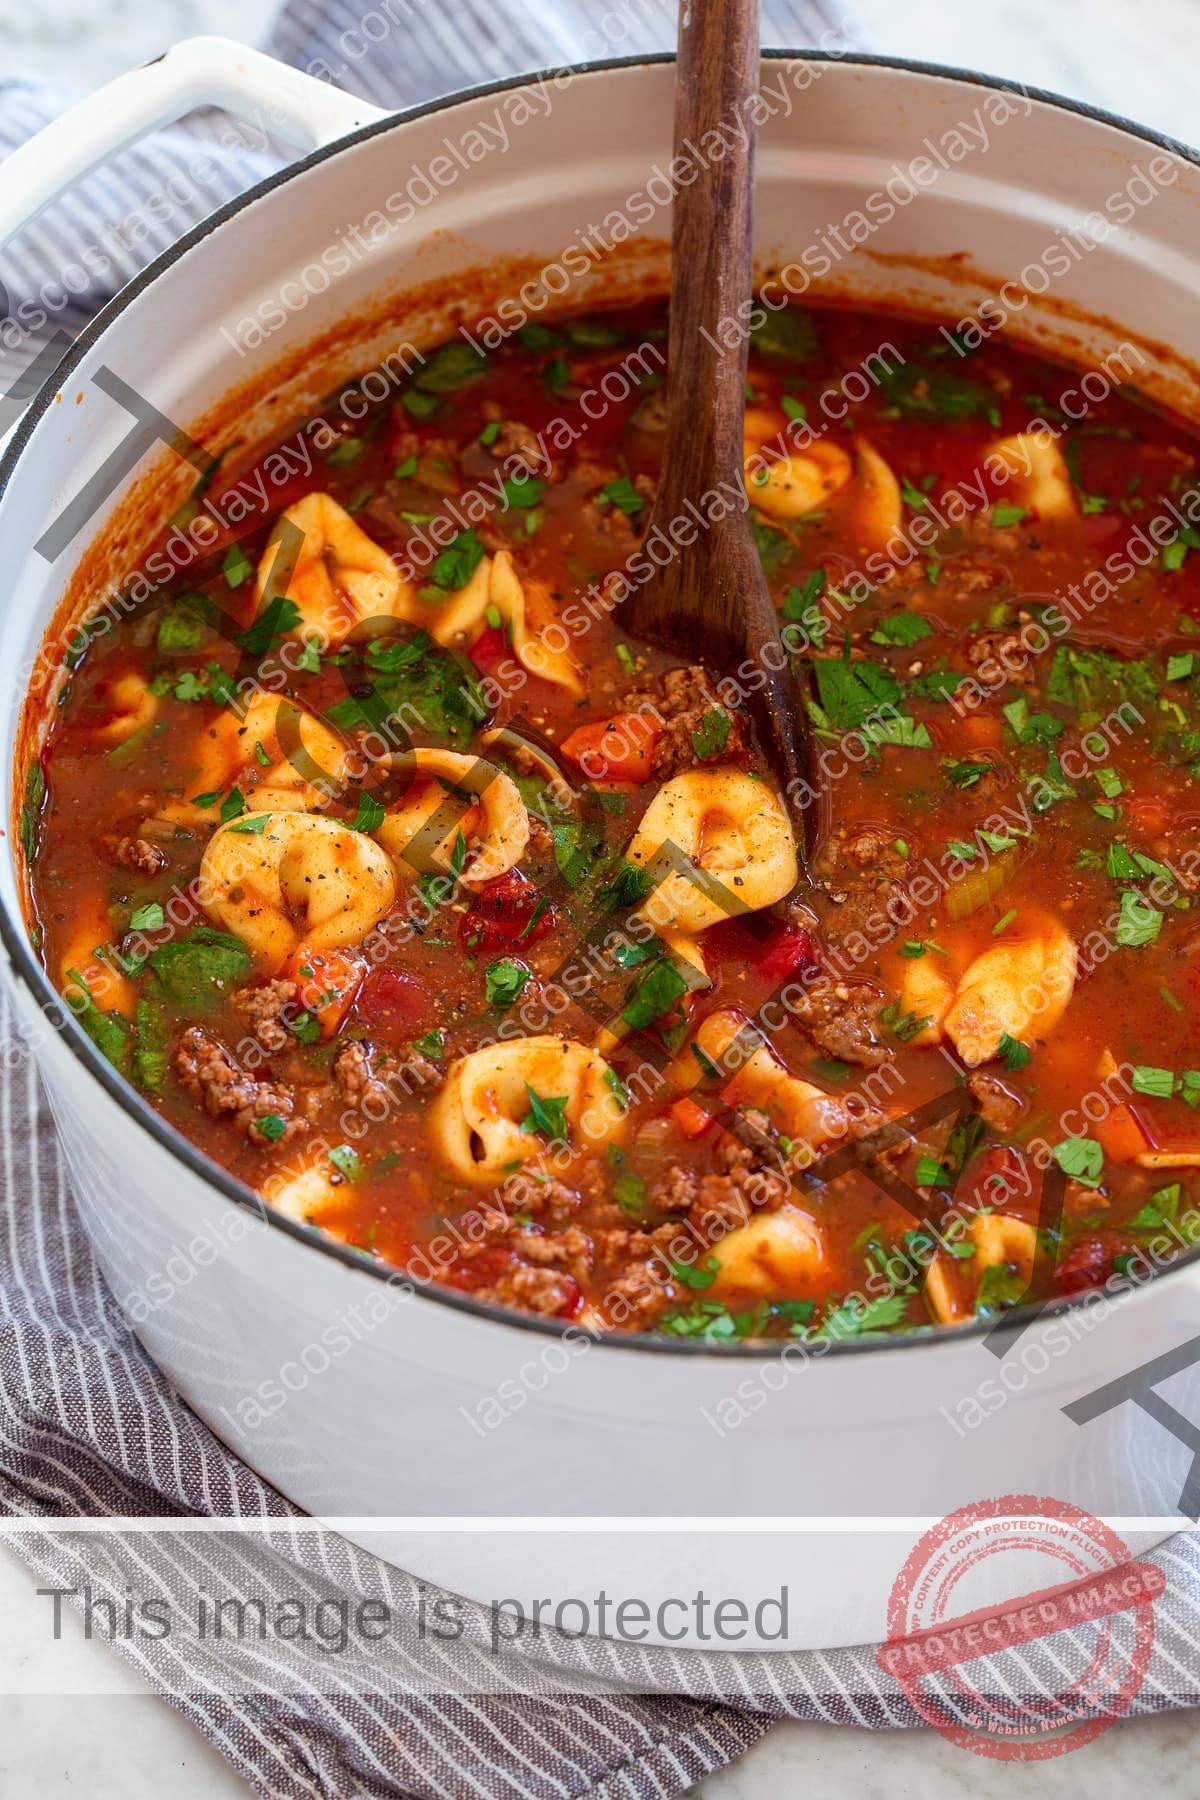 Cacerola blanca llena de sopa de tortellini.